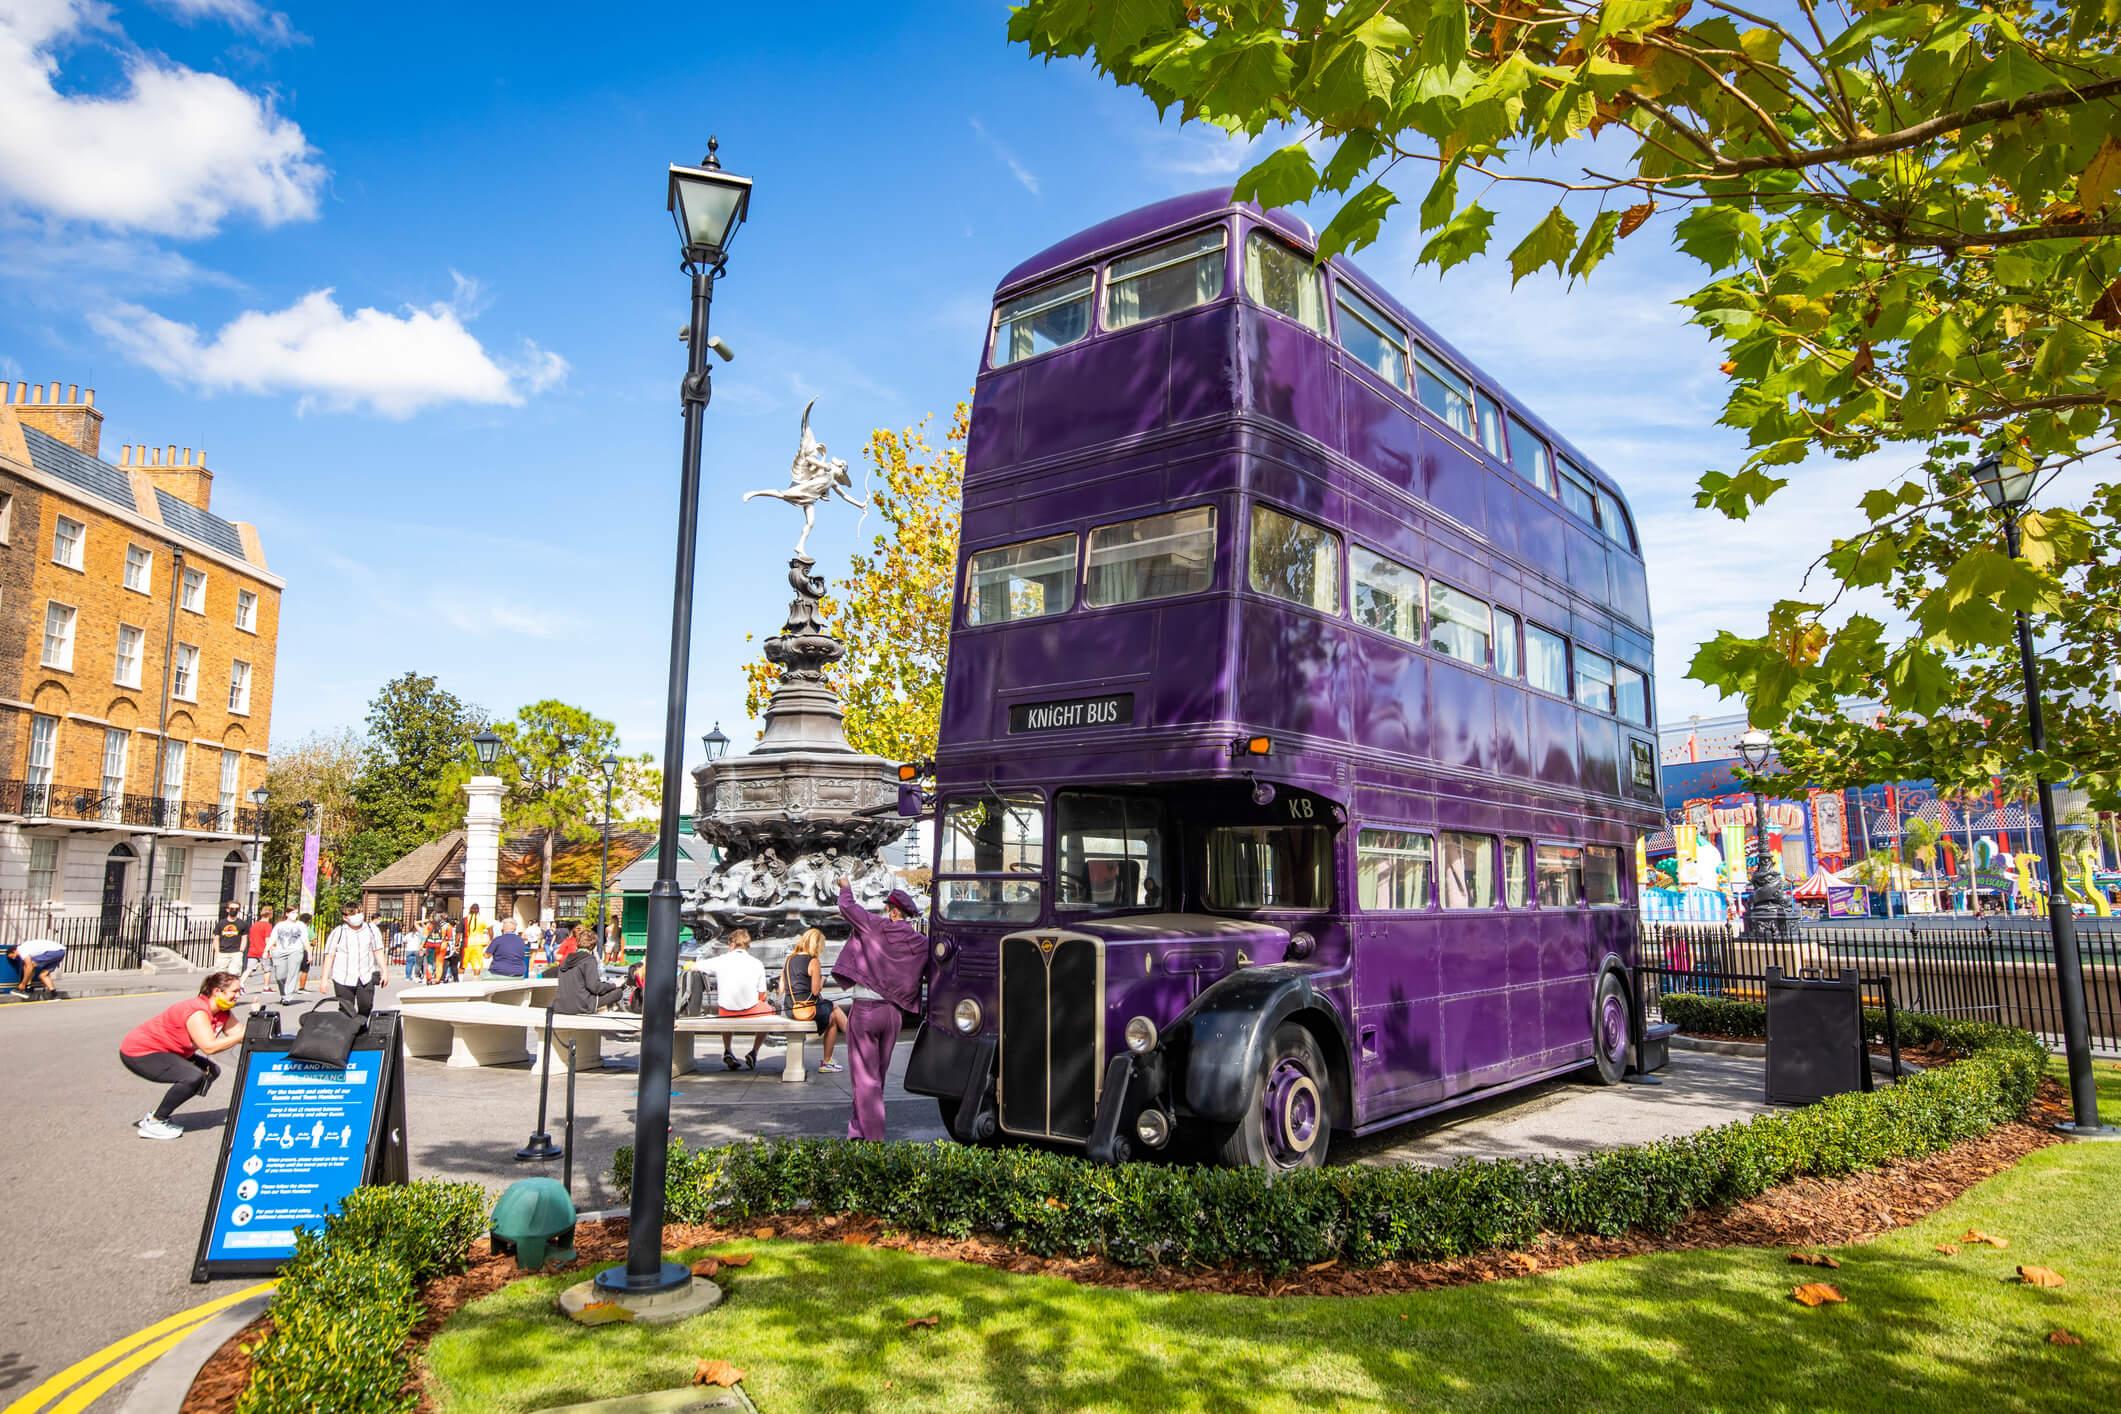 The Knight Bus Universal Studios